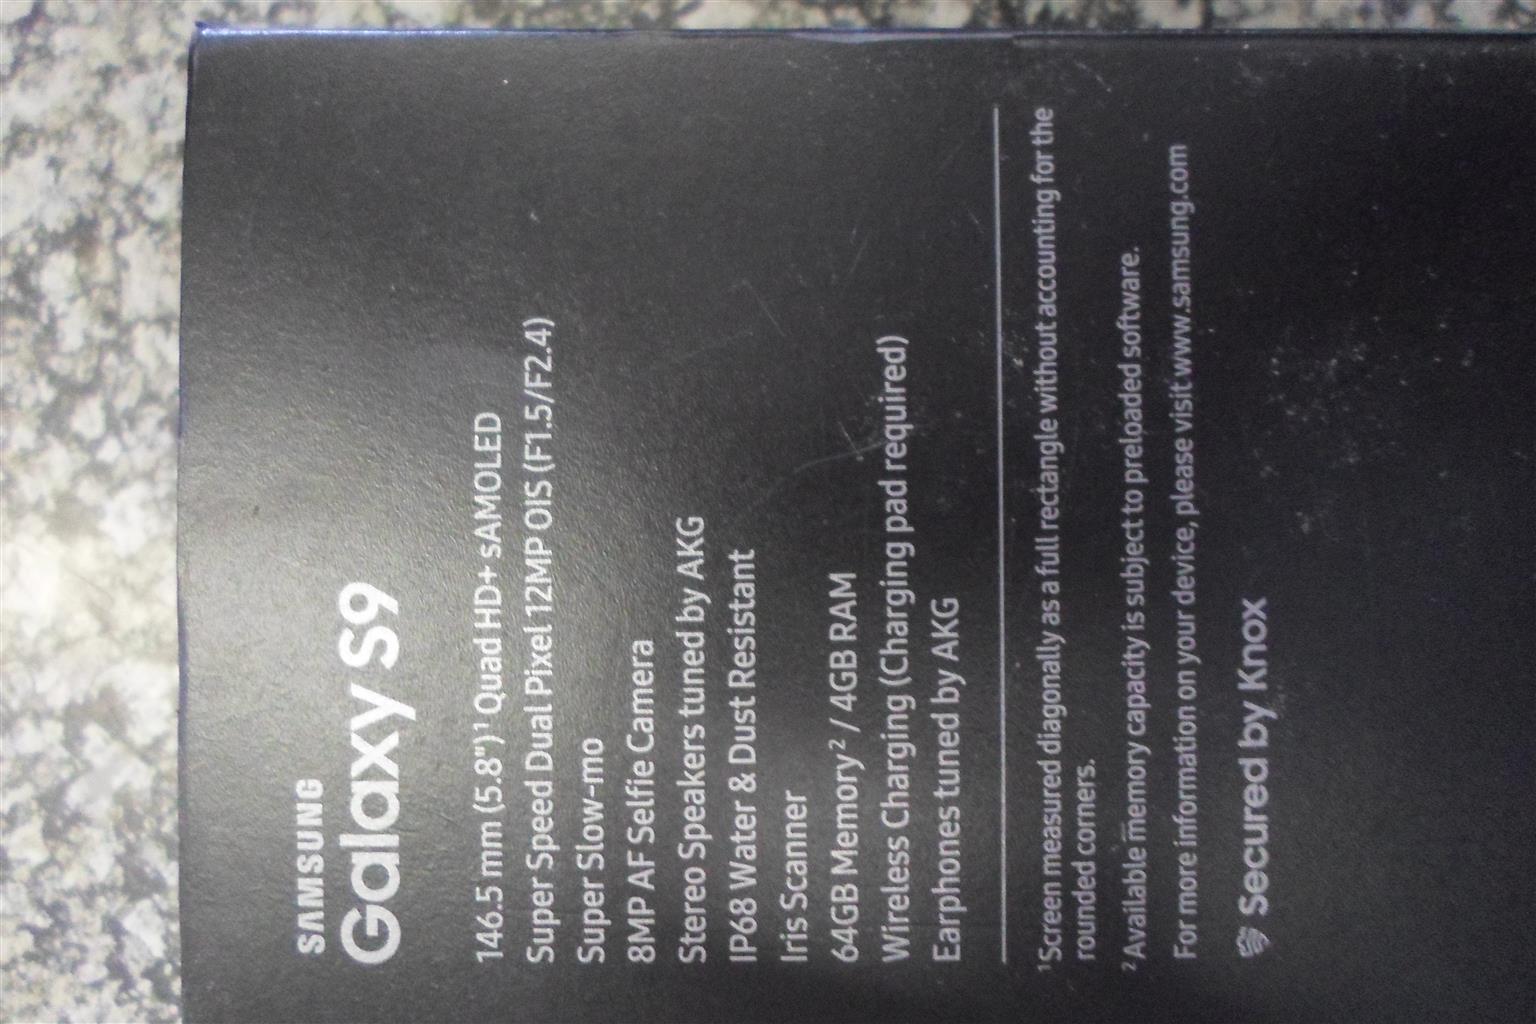 64GB Samsung S9